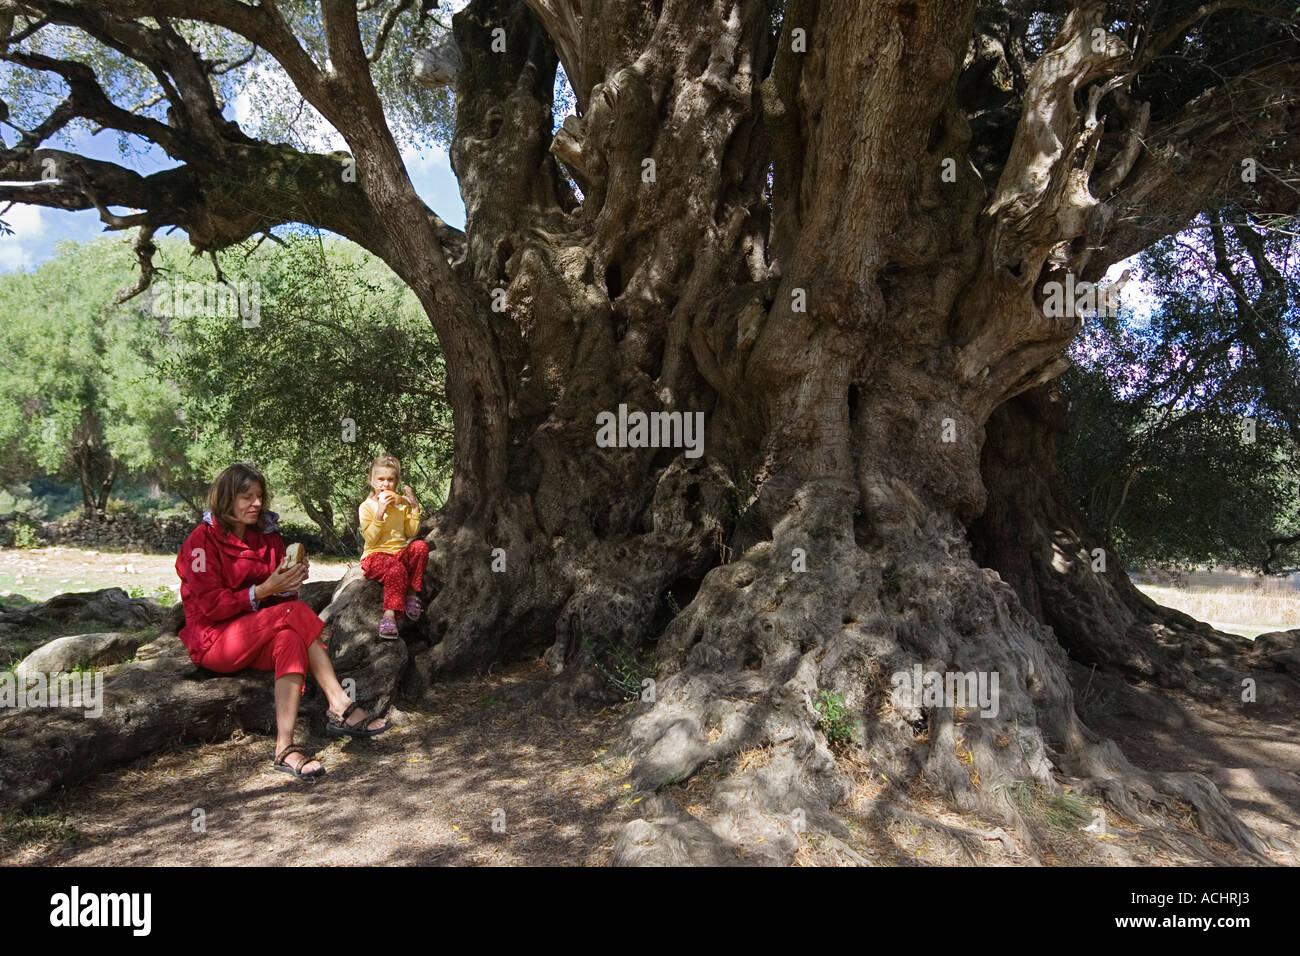 Break under three thousand years old Olive Tree, Olivastri millenari, Sardinia, Italy - Stock Image